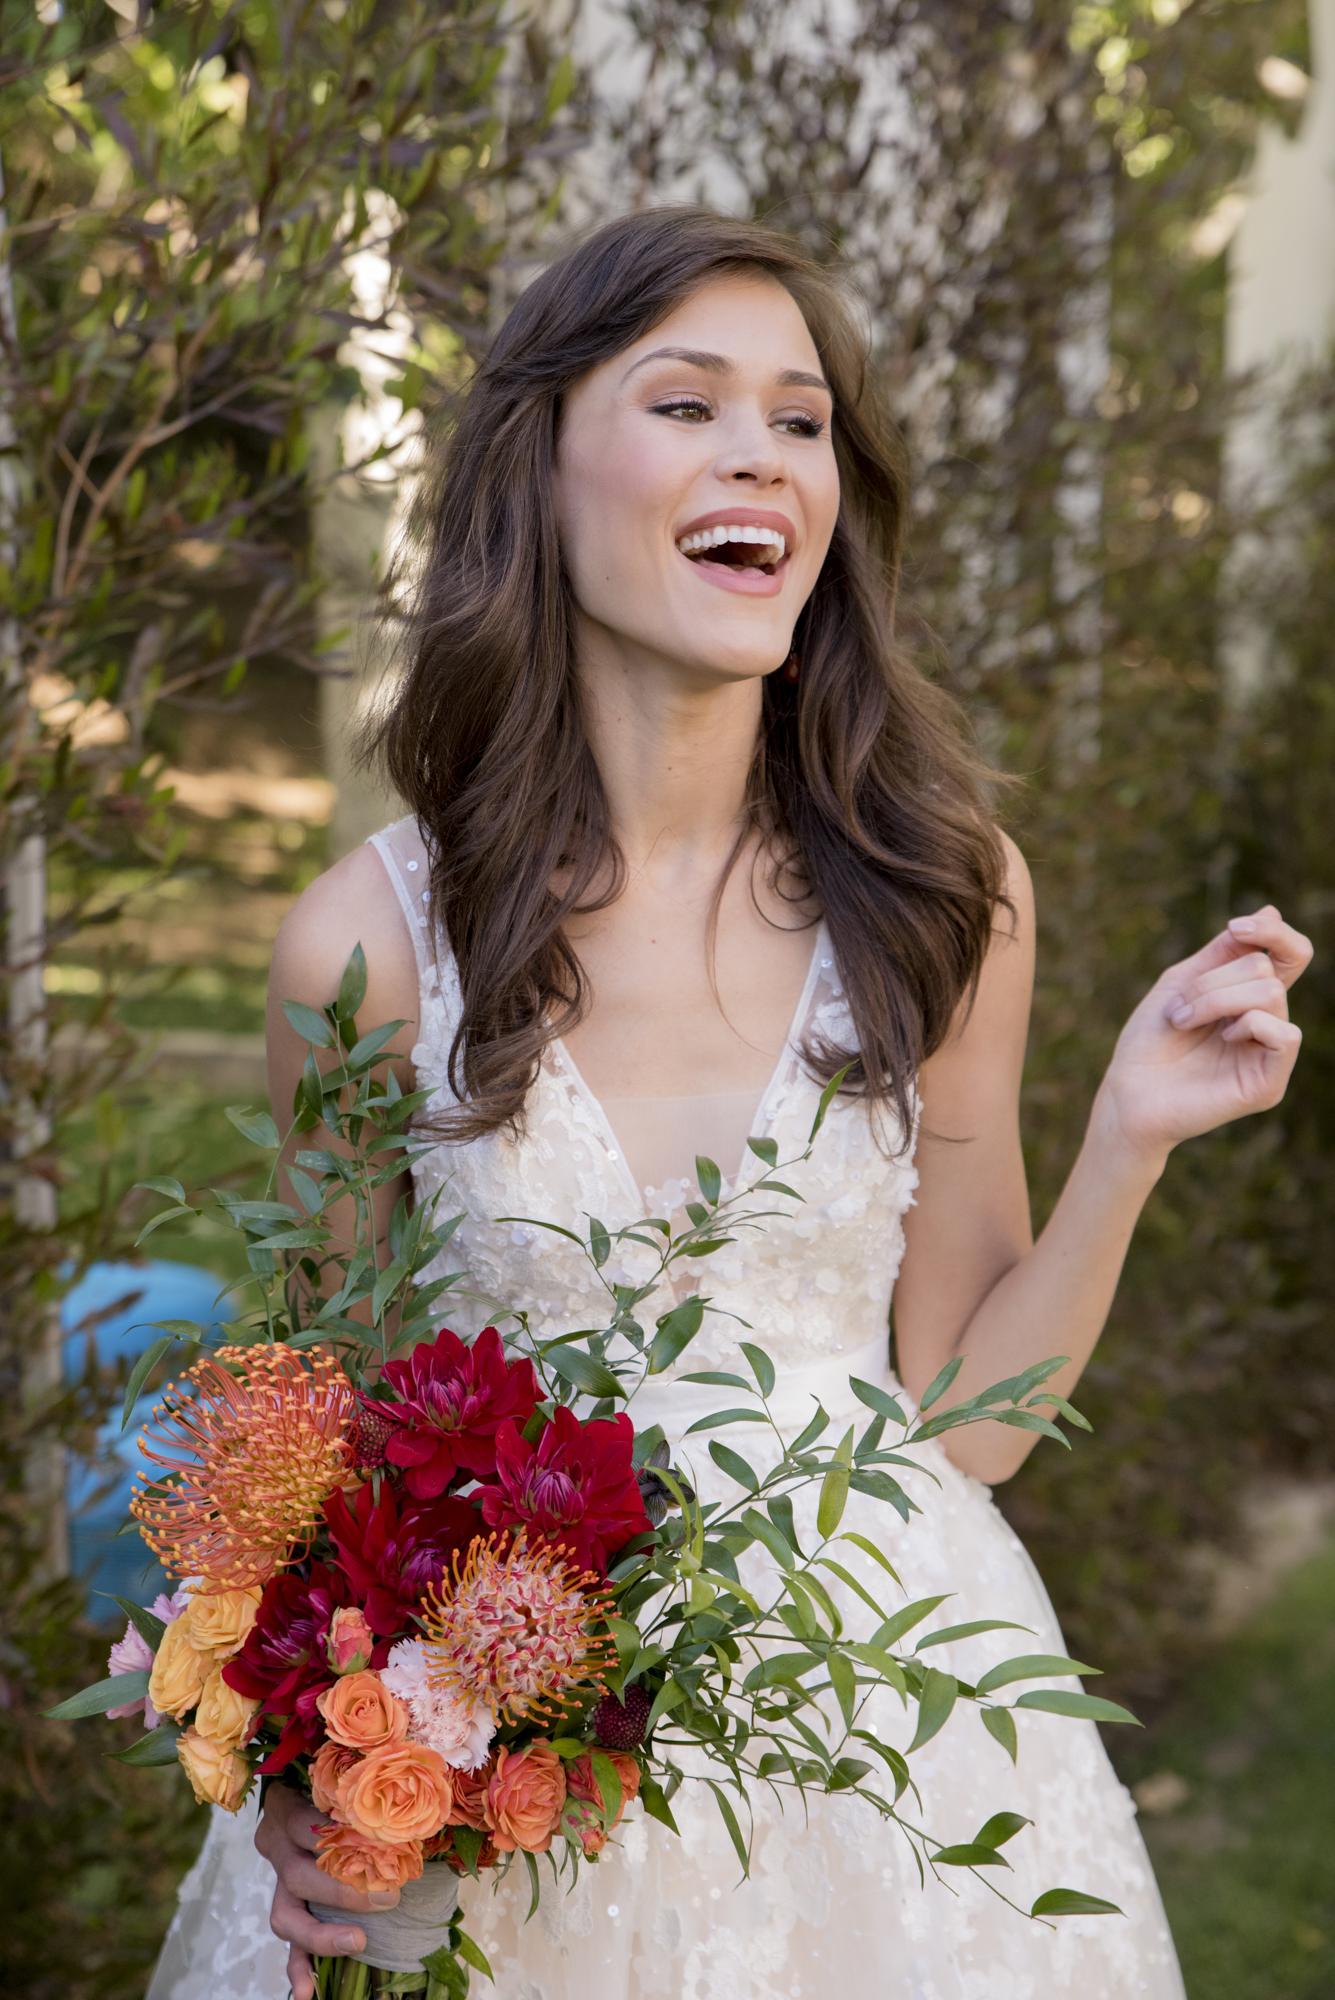 arthousephotographs.com | Los Angeles Wedding Photographer | Memphis Wedding Photographer | Nashville Wedding Photographer | Destination Wedding Photographer | Arthouse Photographs